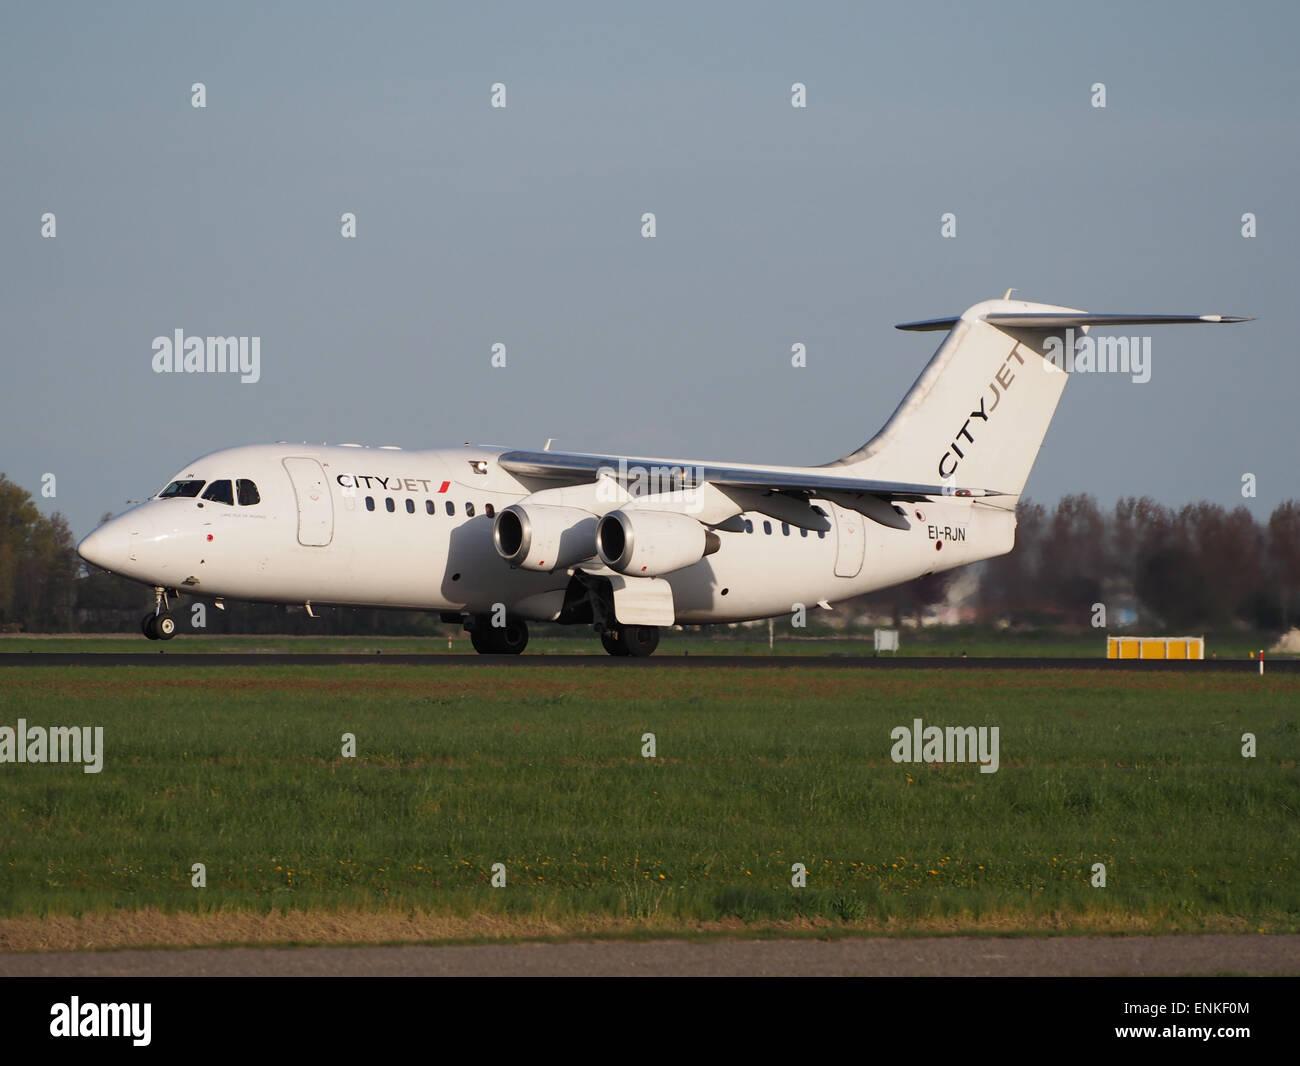 CityJet EI-RJN BAe 146 - Avro RJ takeoff from Polderbaan, Schiphol (AMS - EHAM) at sunset, - Stock Image